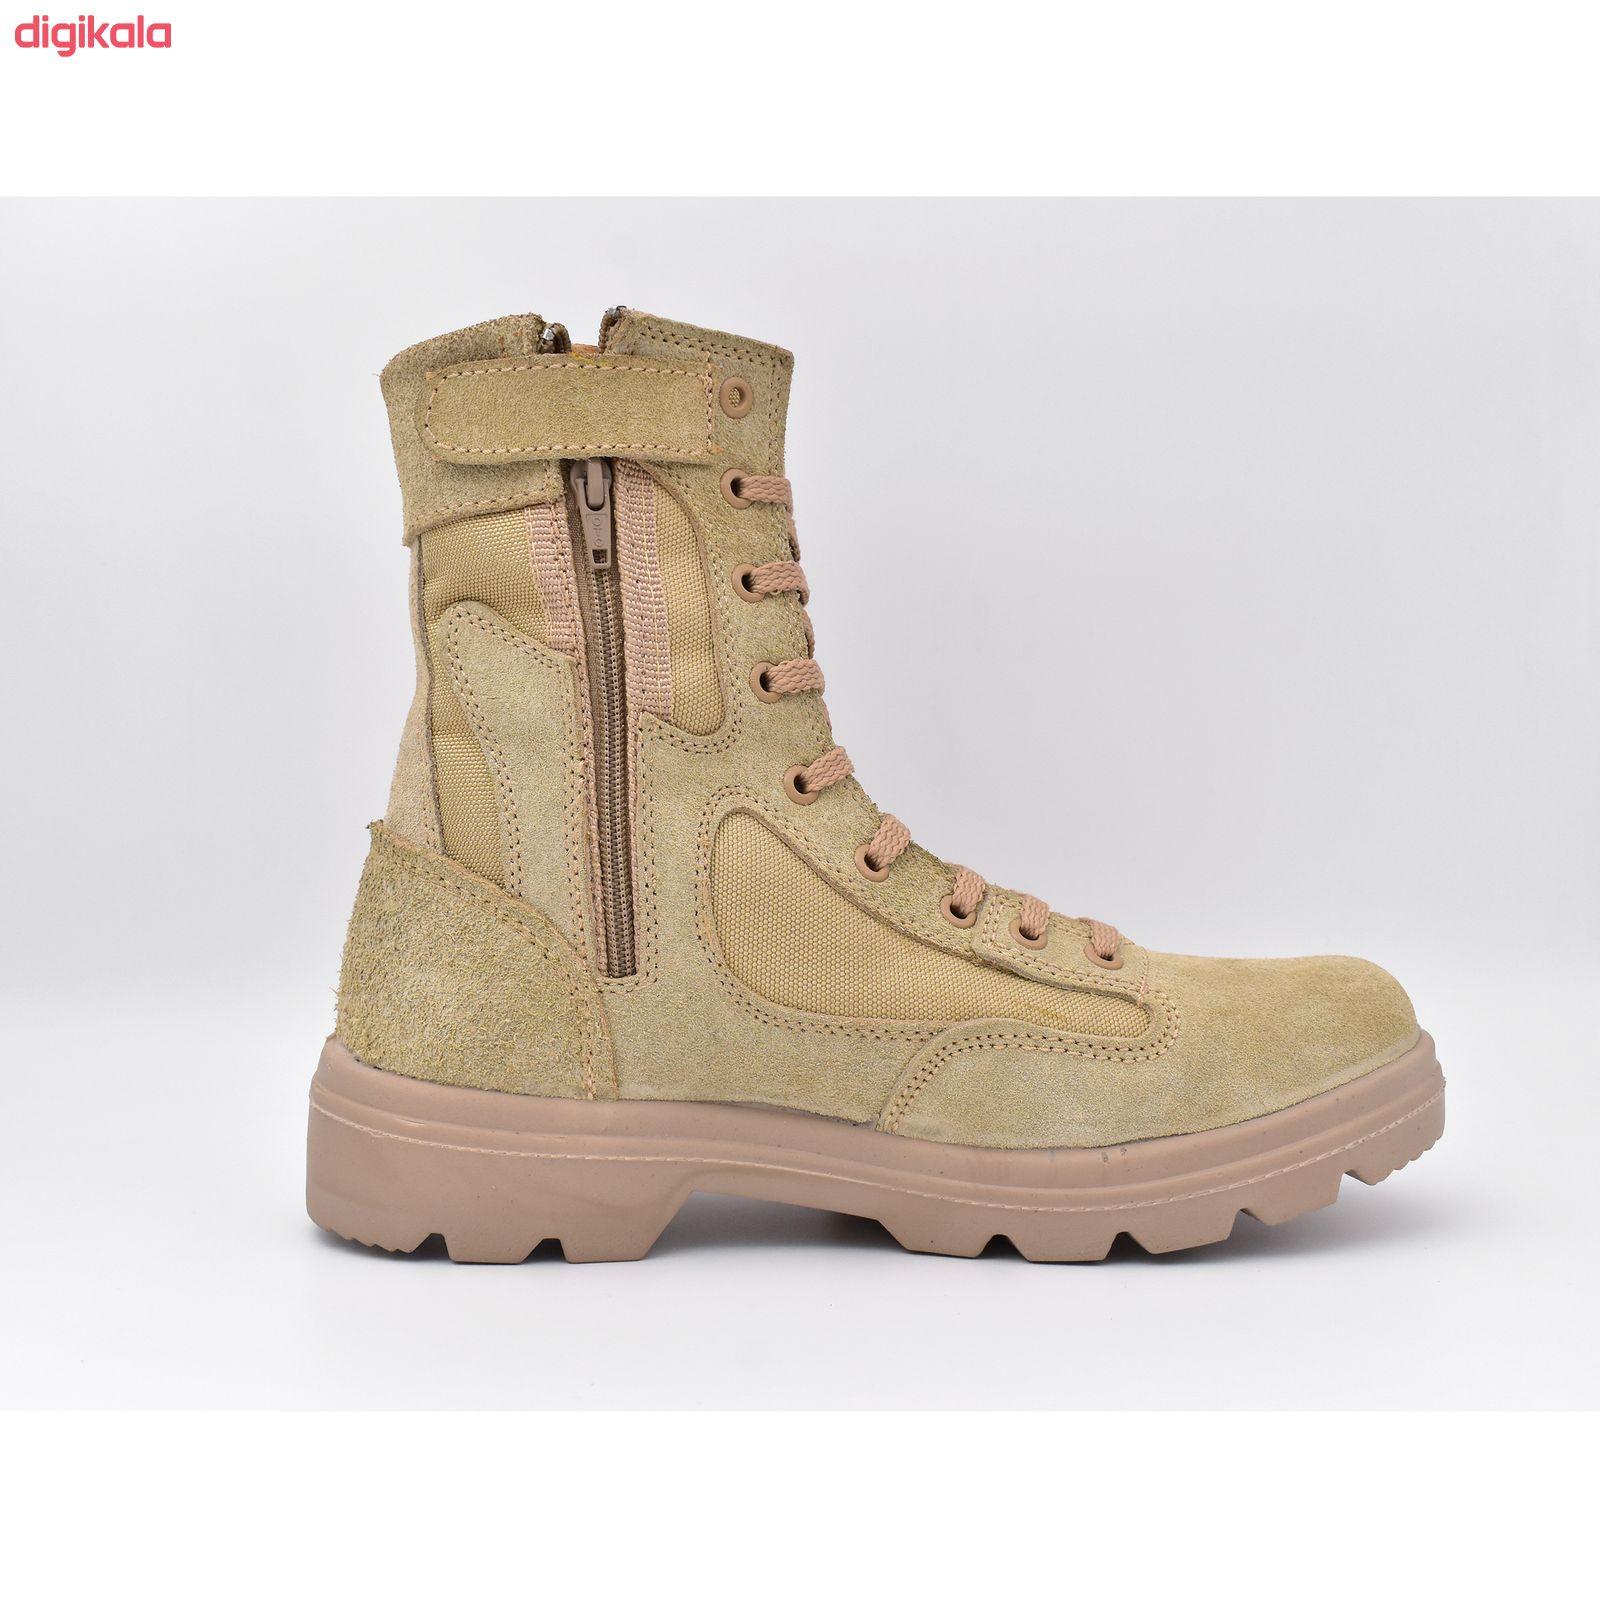 کفش کوهنوردی مردانه مدل Razm کد 8485 main 1 12